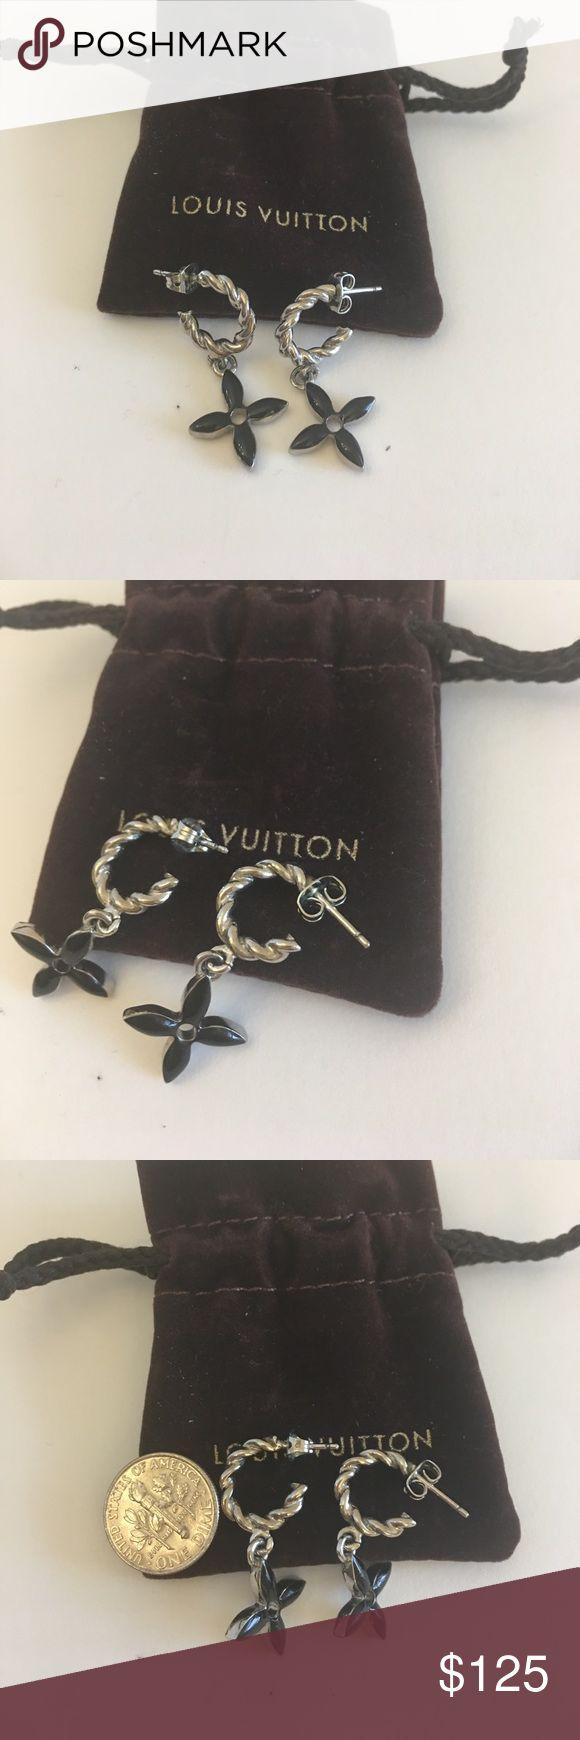 Authentic Louis Vuitton Earrings Authentic Louis Vuitton Earrings Louis Vuitton Jewelry Earrings